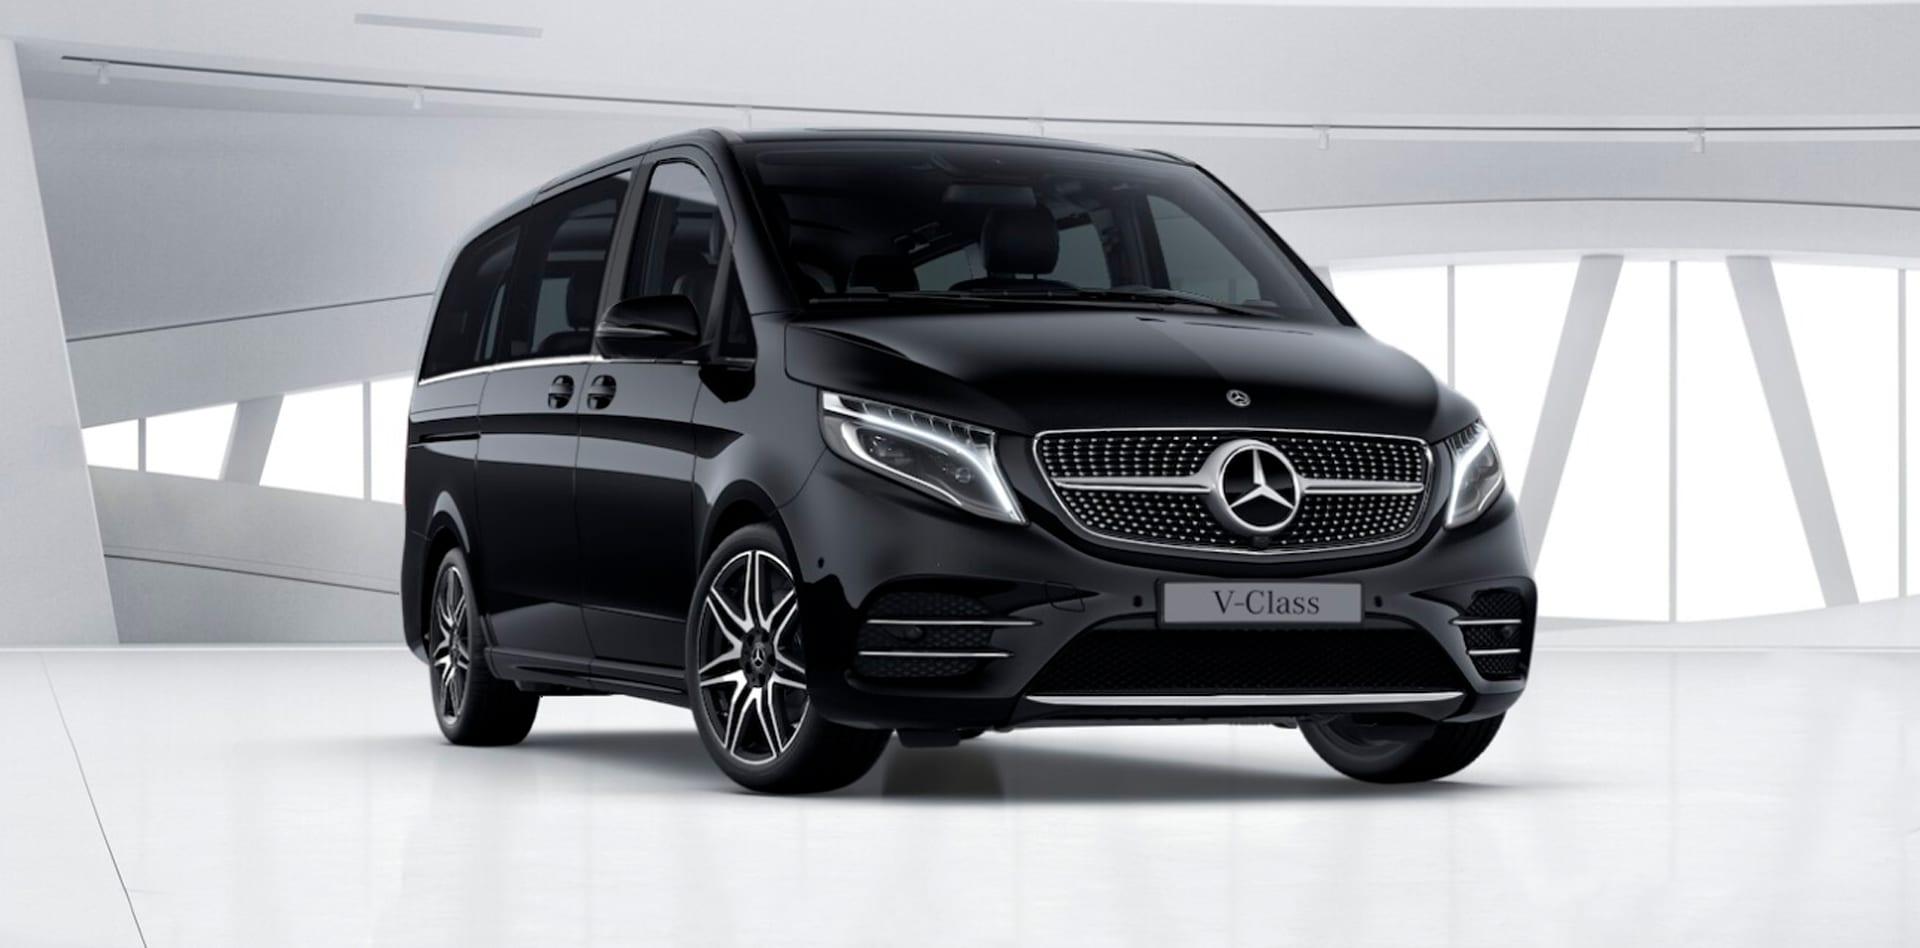 Mercedes-Benz V-Class 5152600194